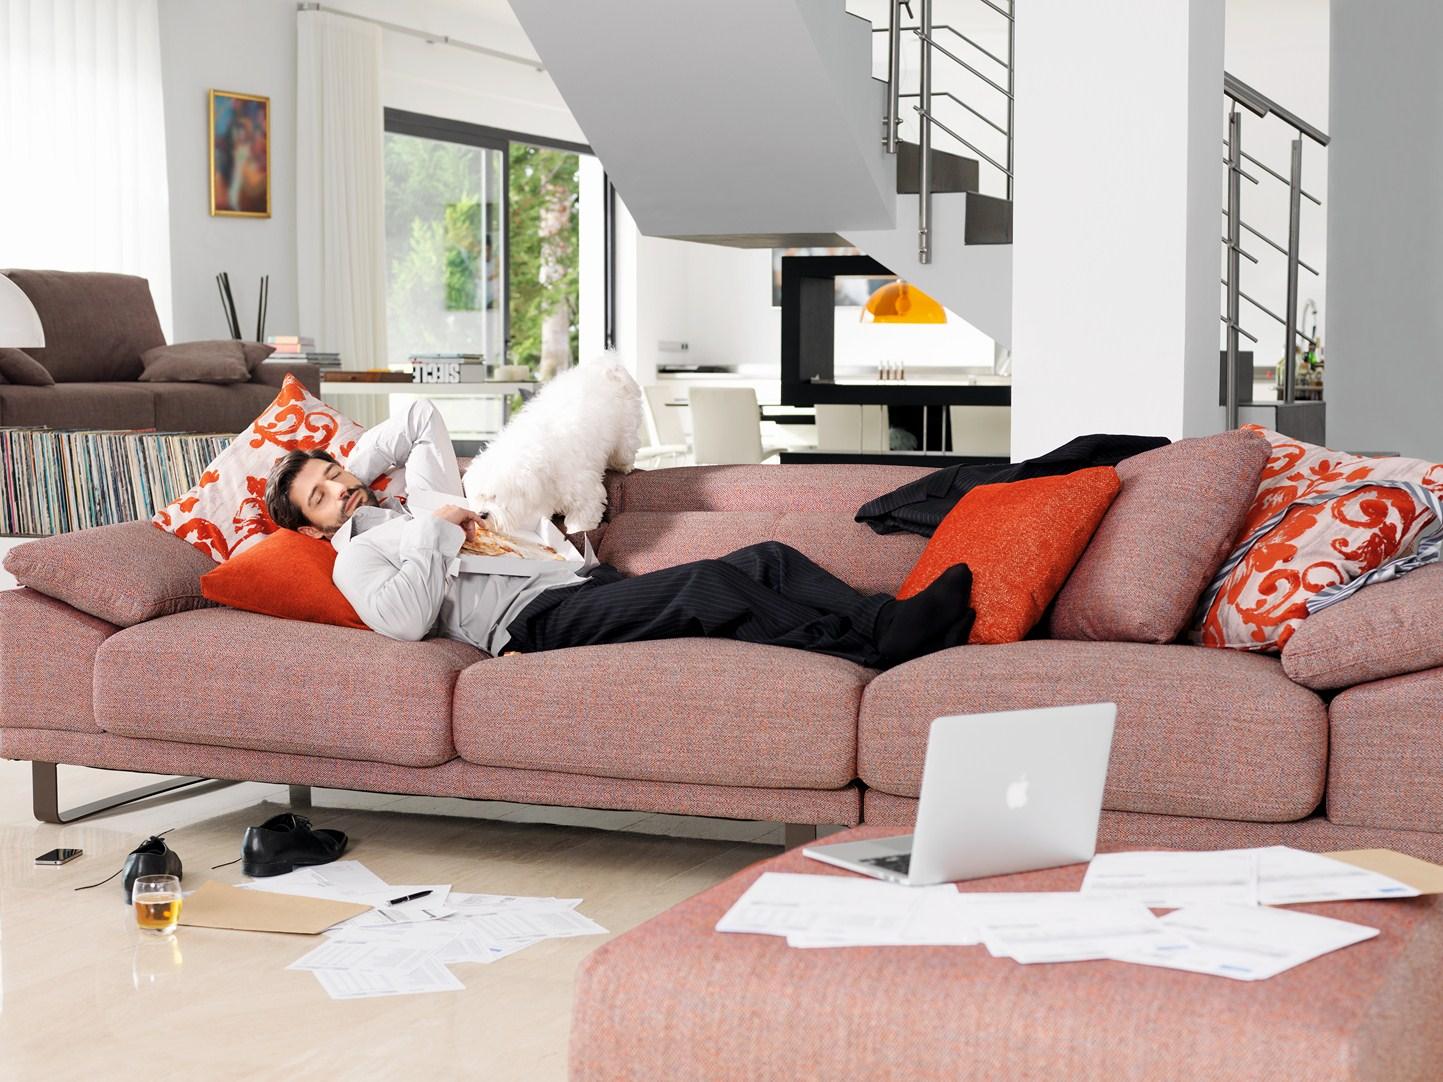 Sillones archivos telasparatapizar blog - Tela para sofa ...